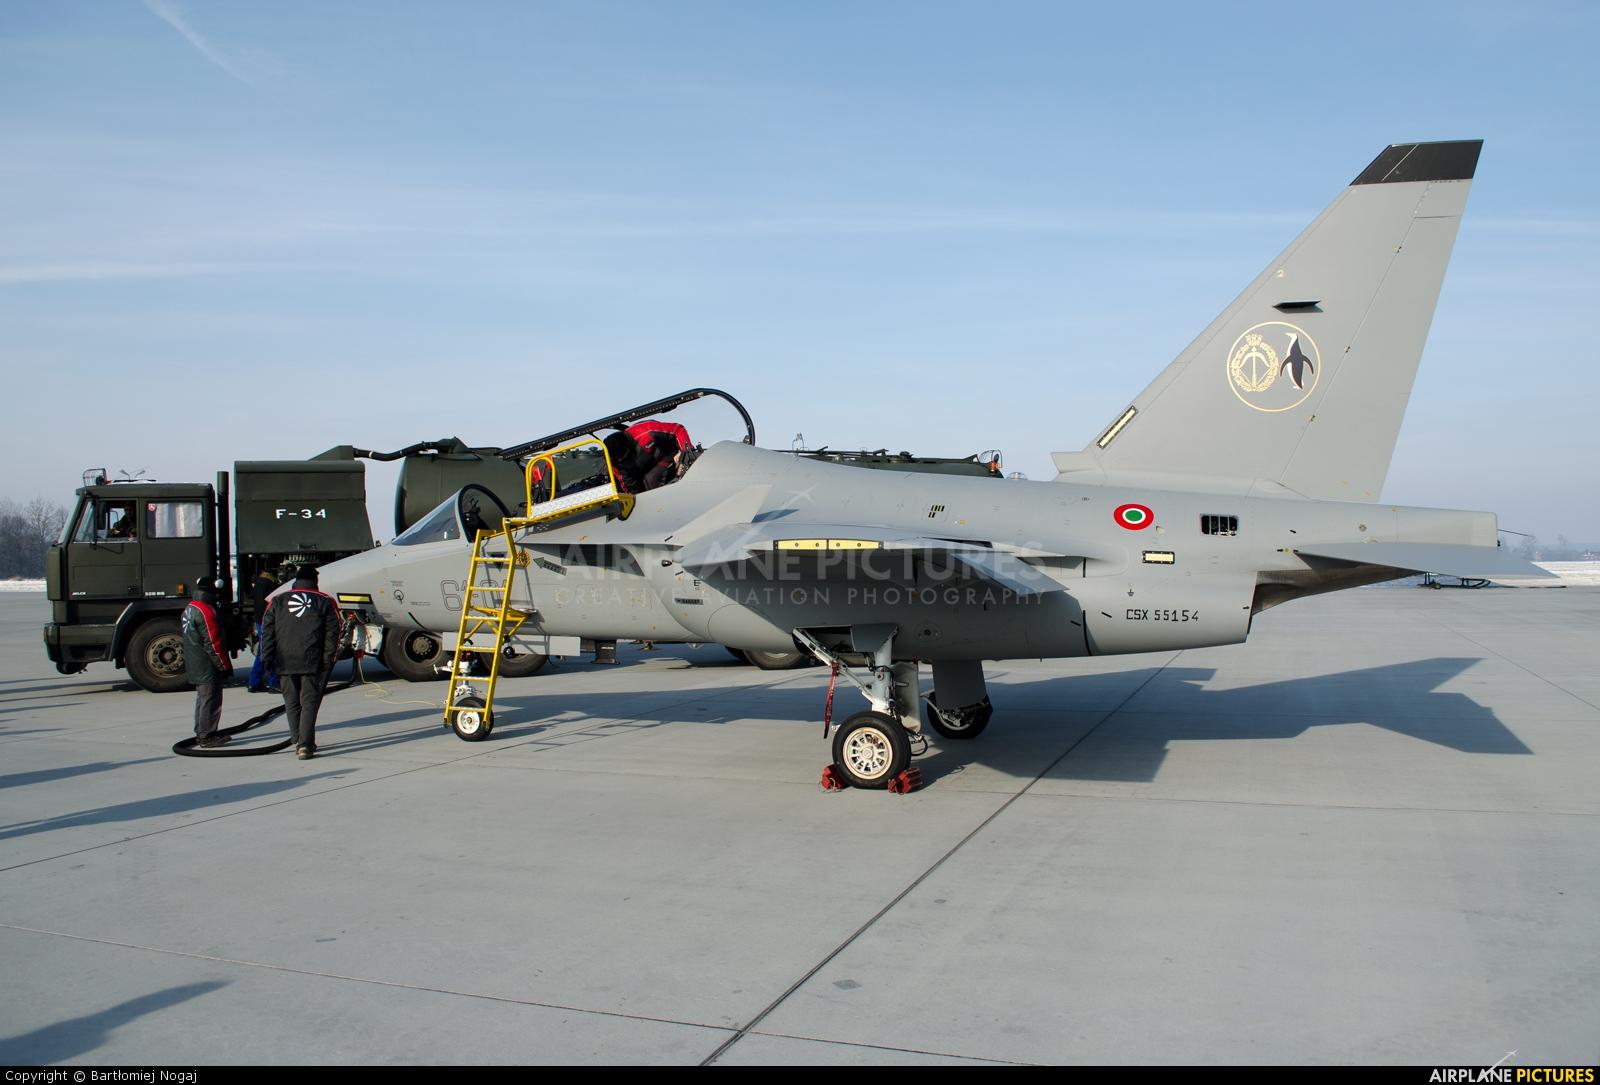 Italy - Air Force CSX55154 aircraft at Dęblin